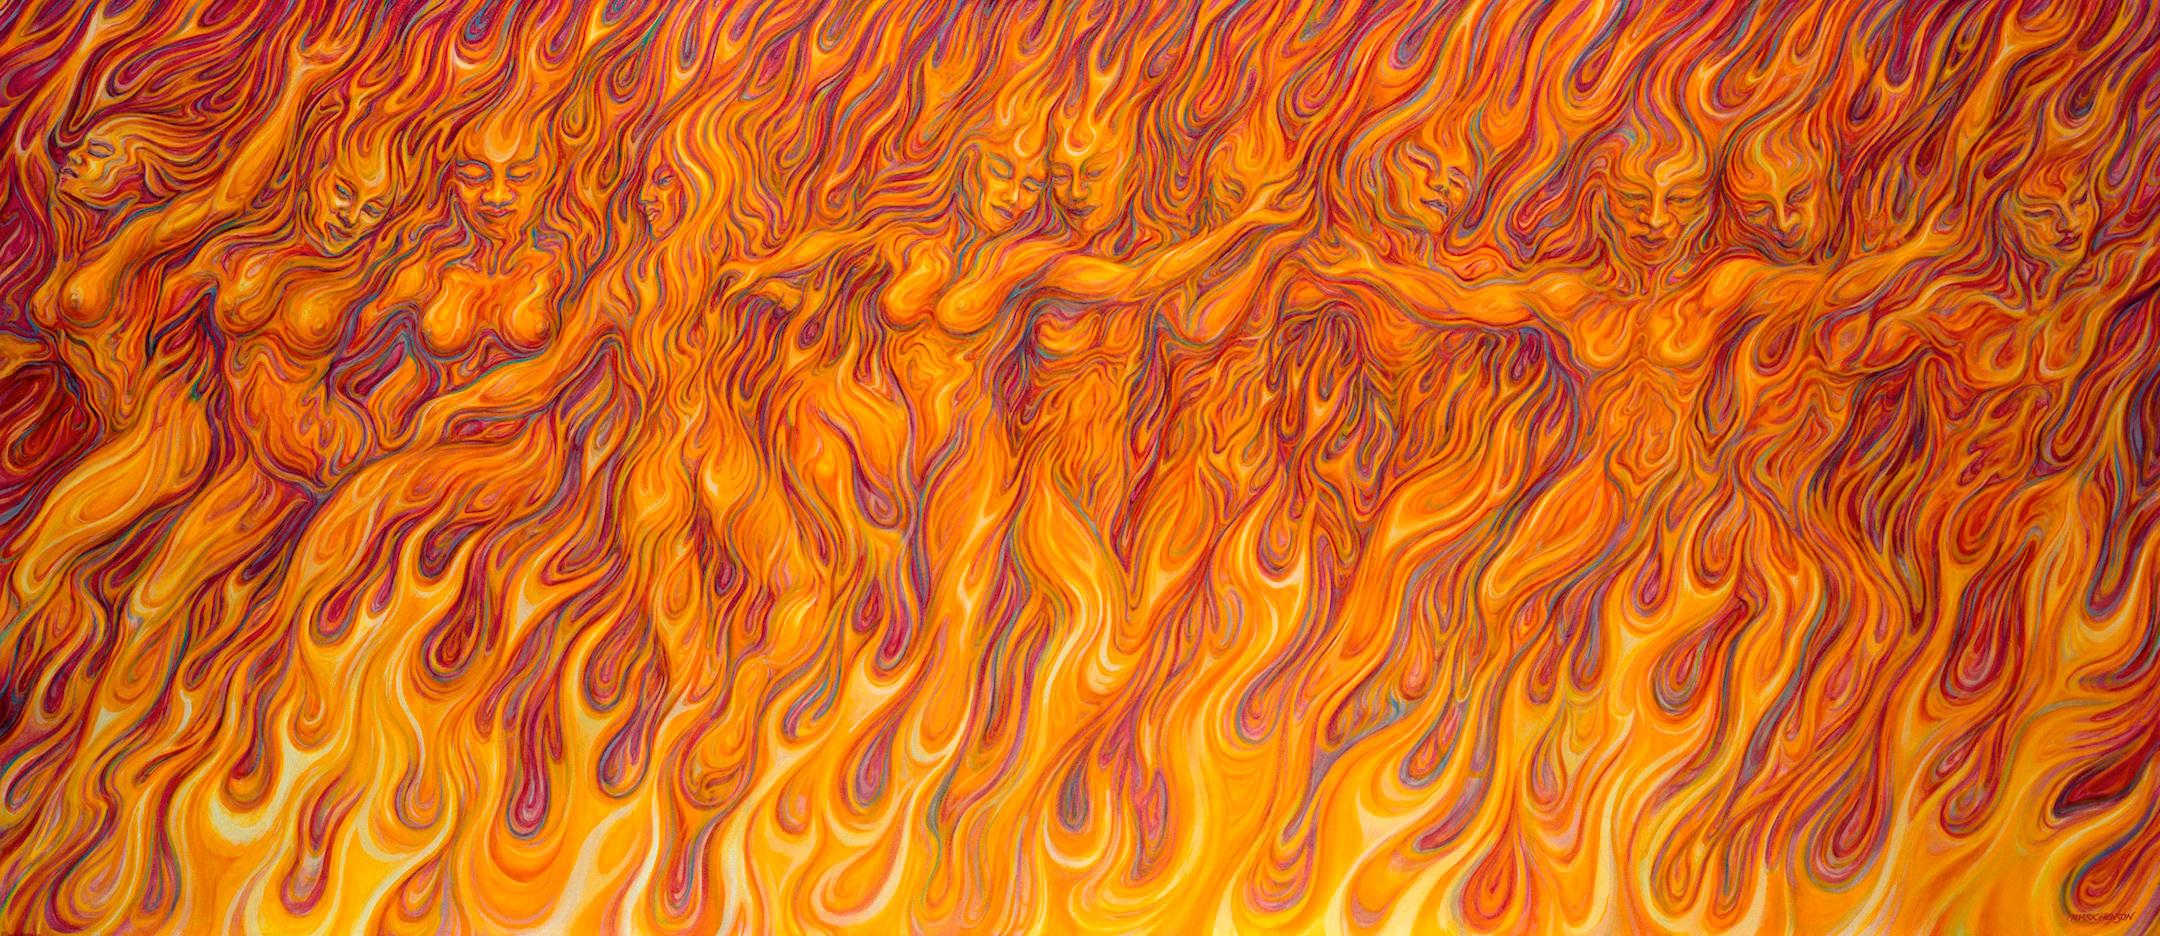 Flames giclee st6npd